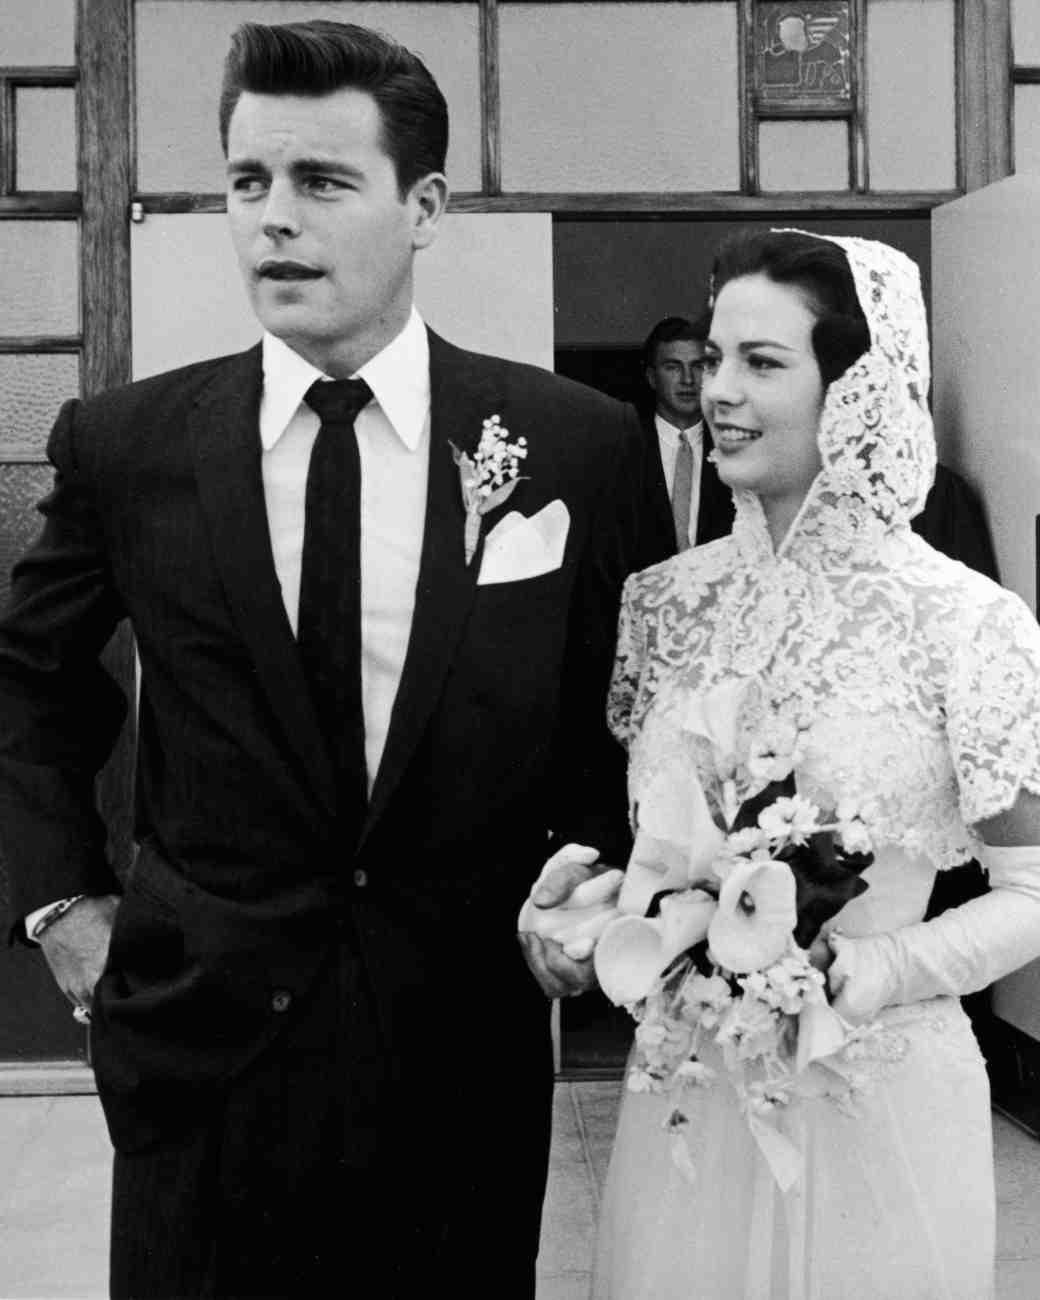 celebrity-brides-veils-natalie-wood-robert-wagner-0615.jpg